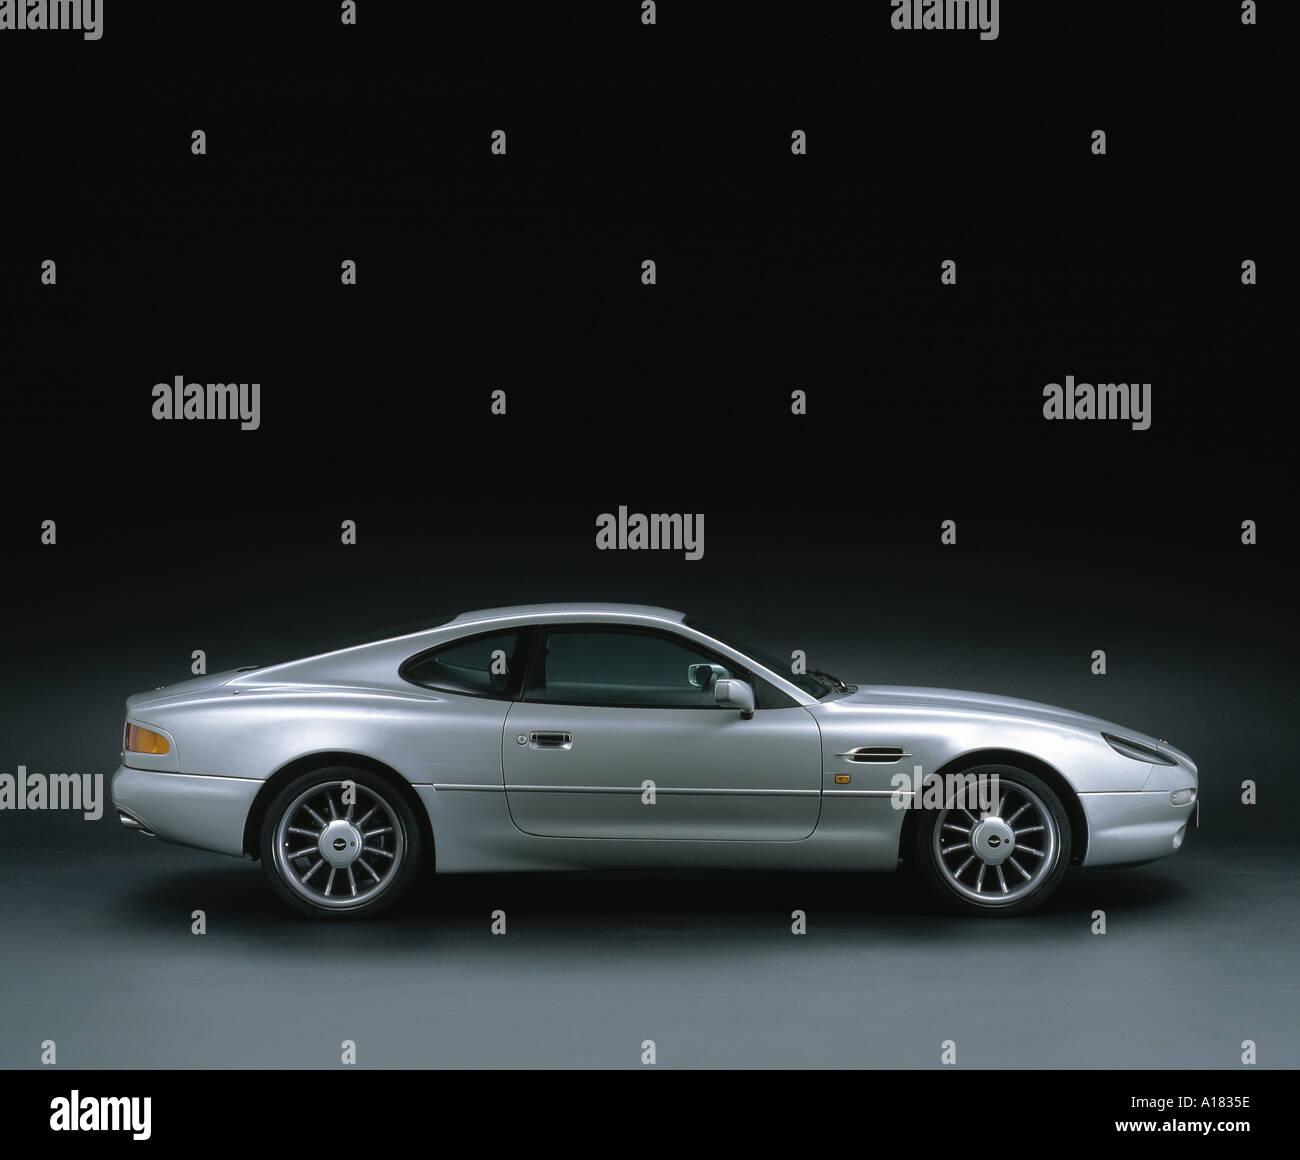 1999 Aston Martin DB7 Dunhill - Stock Image